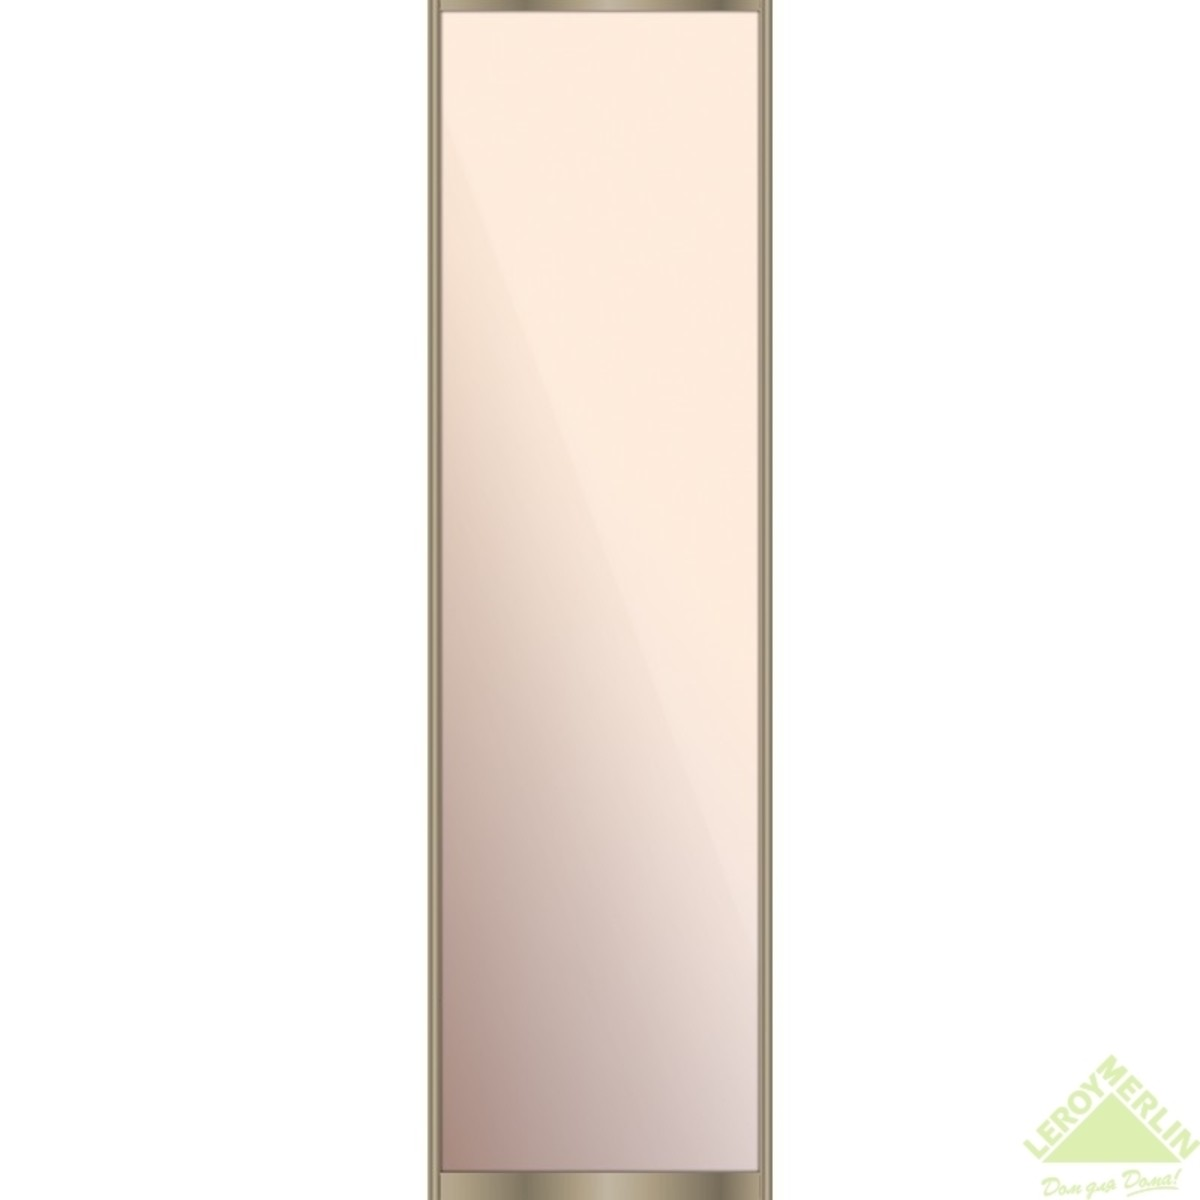 Дверь-купе 2251х804 мм зеркало цвет серебро/шампань